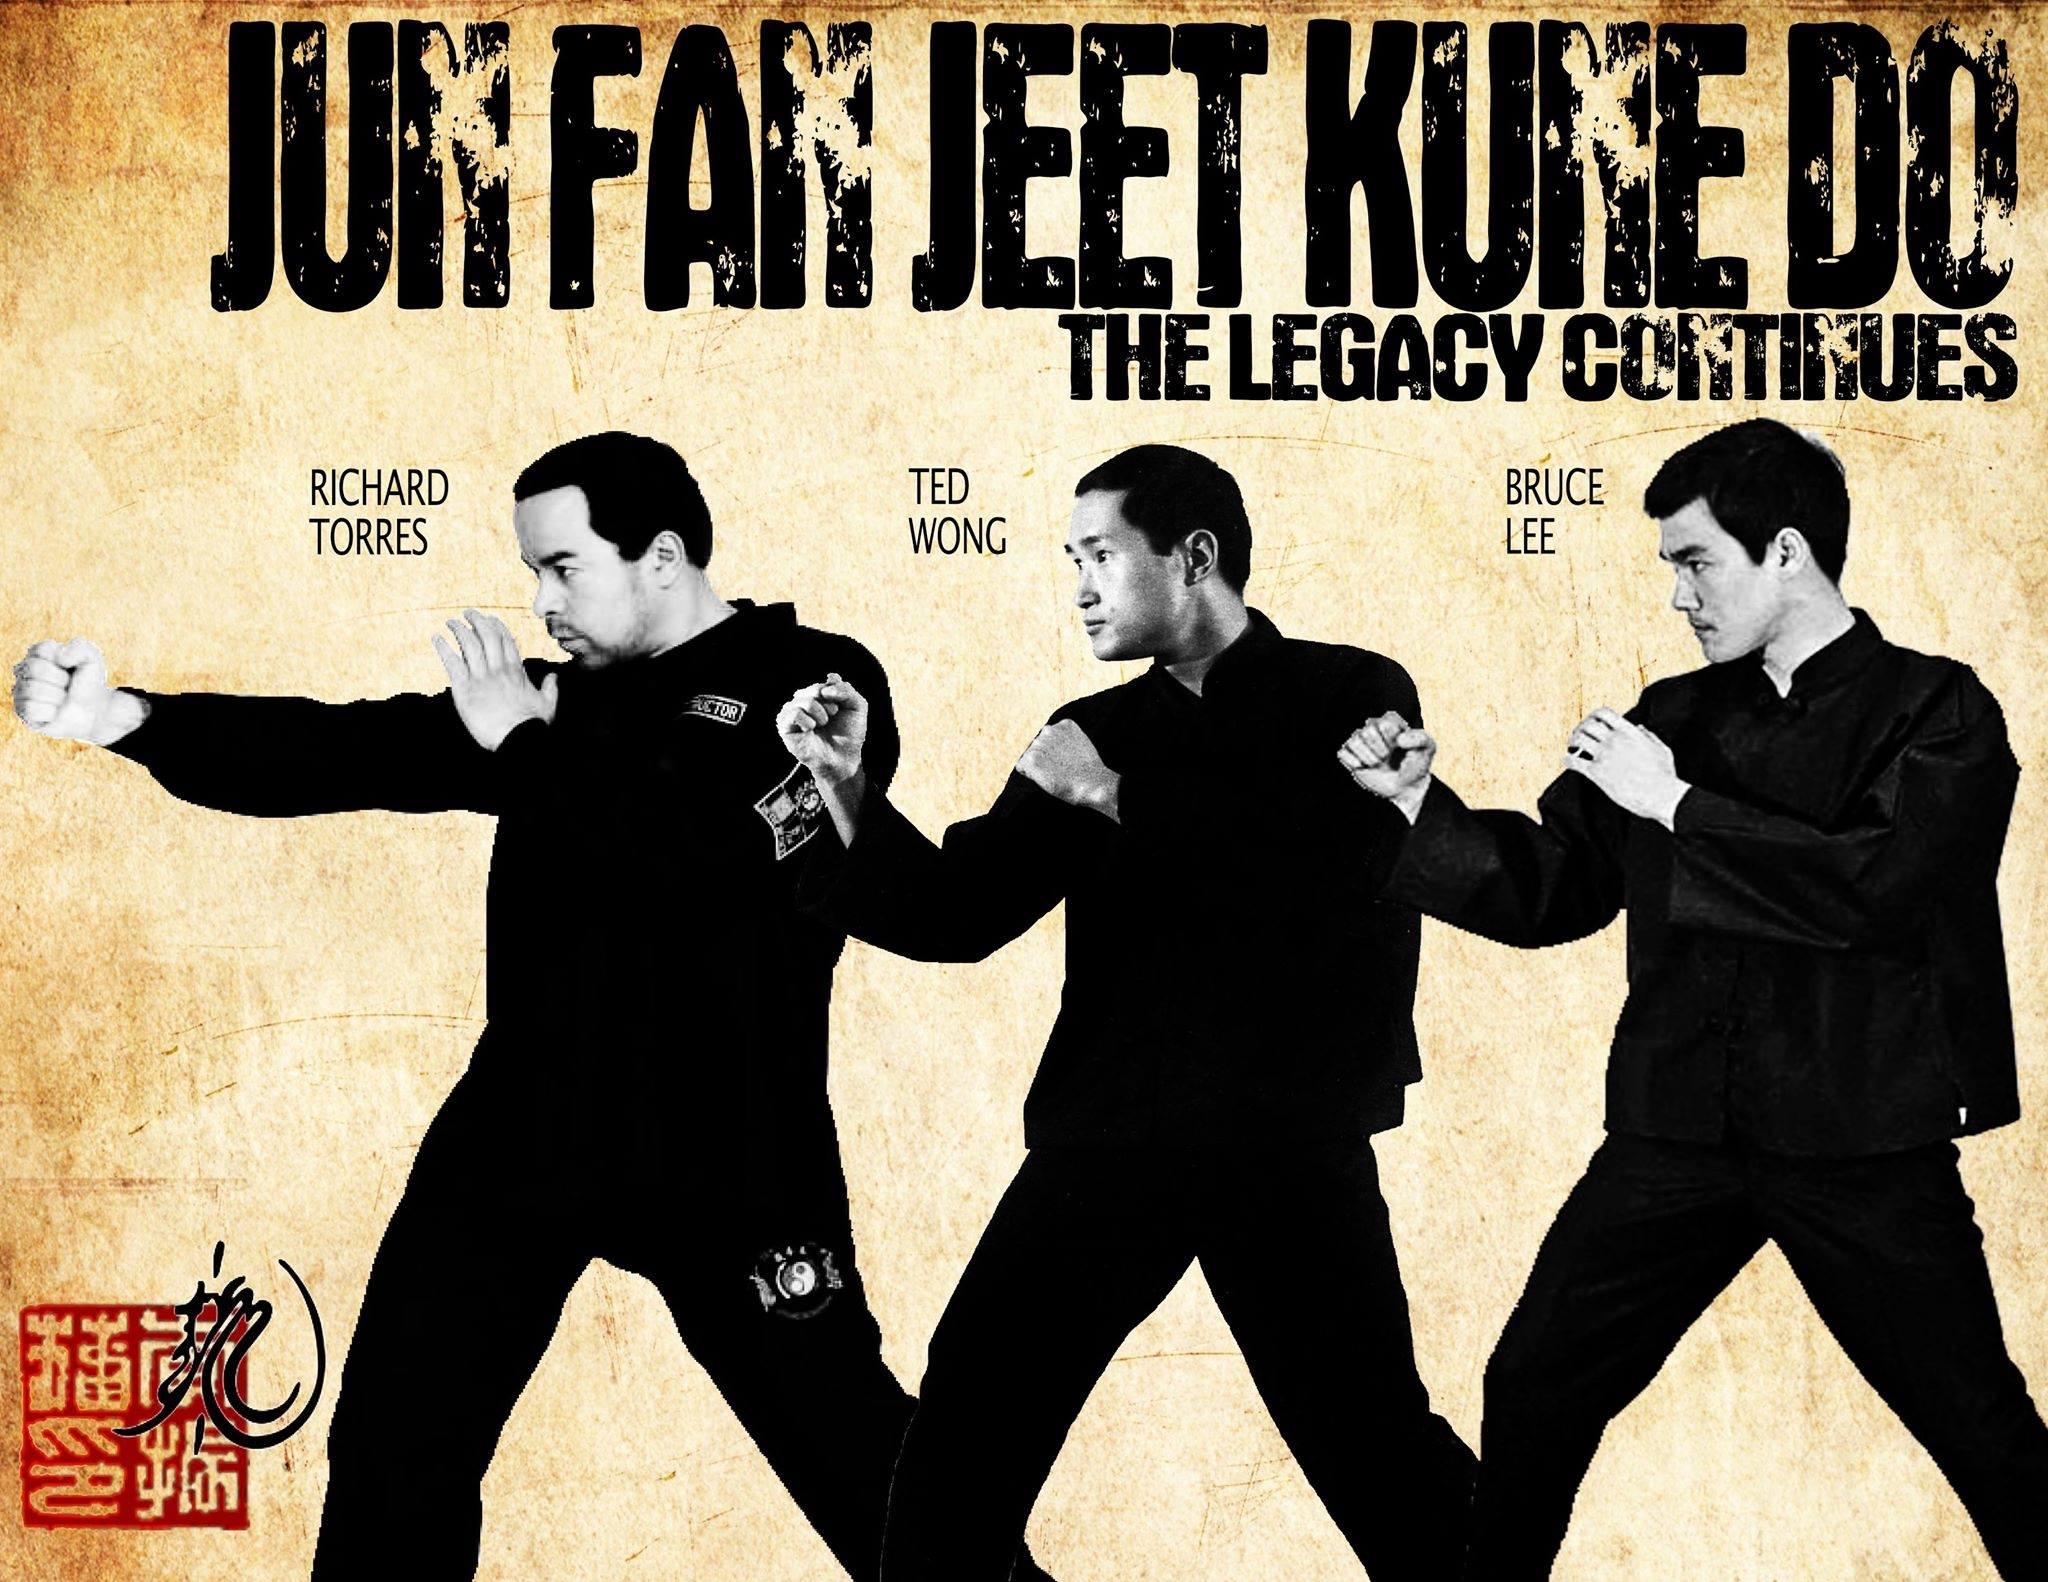 JKD lineage